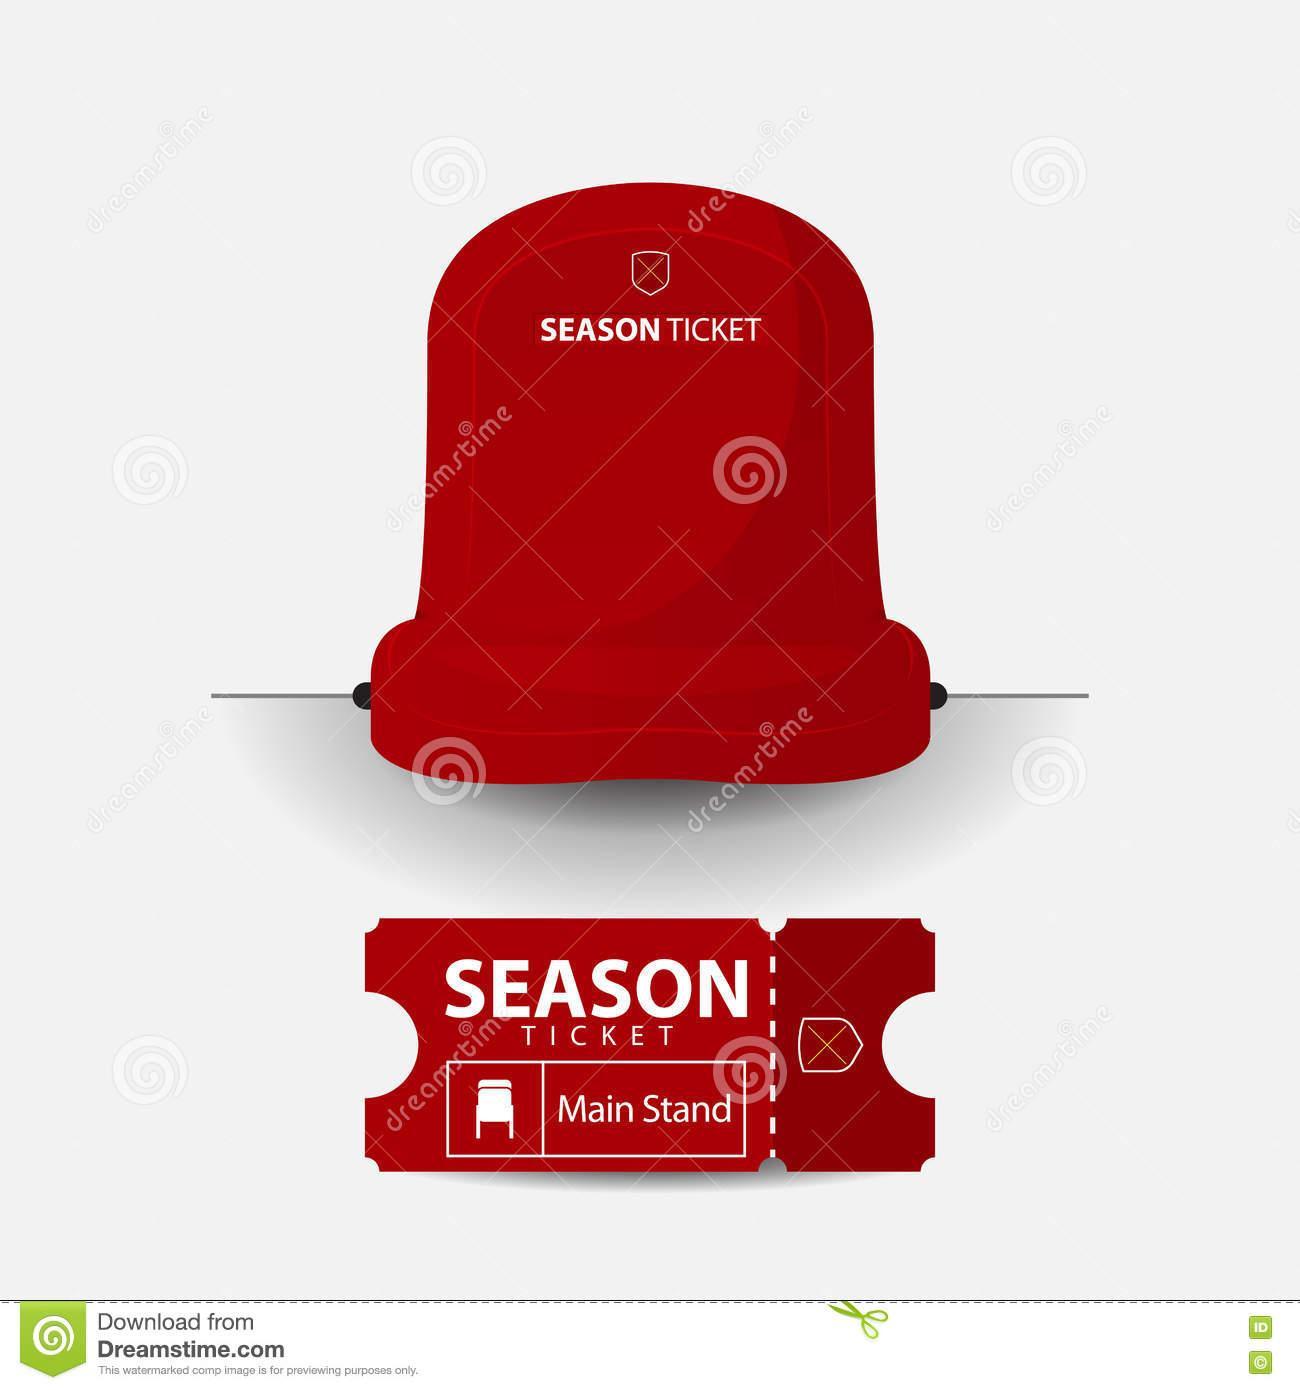 Football Season Ticket Template